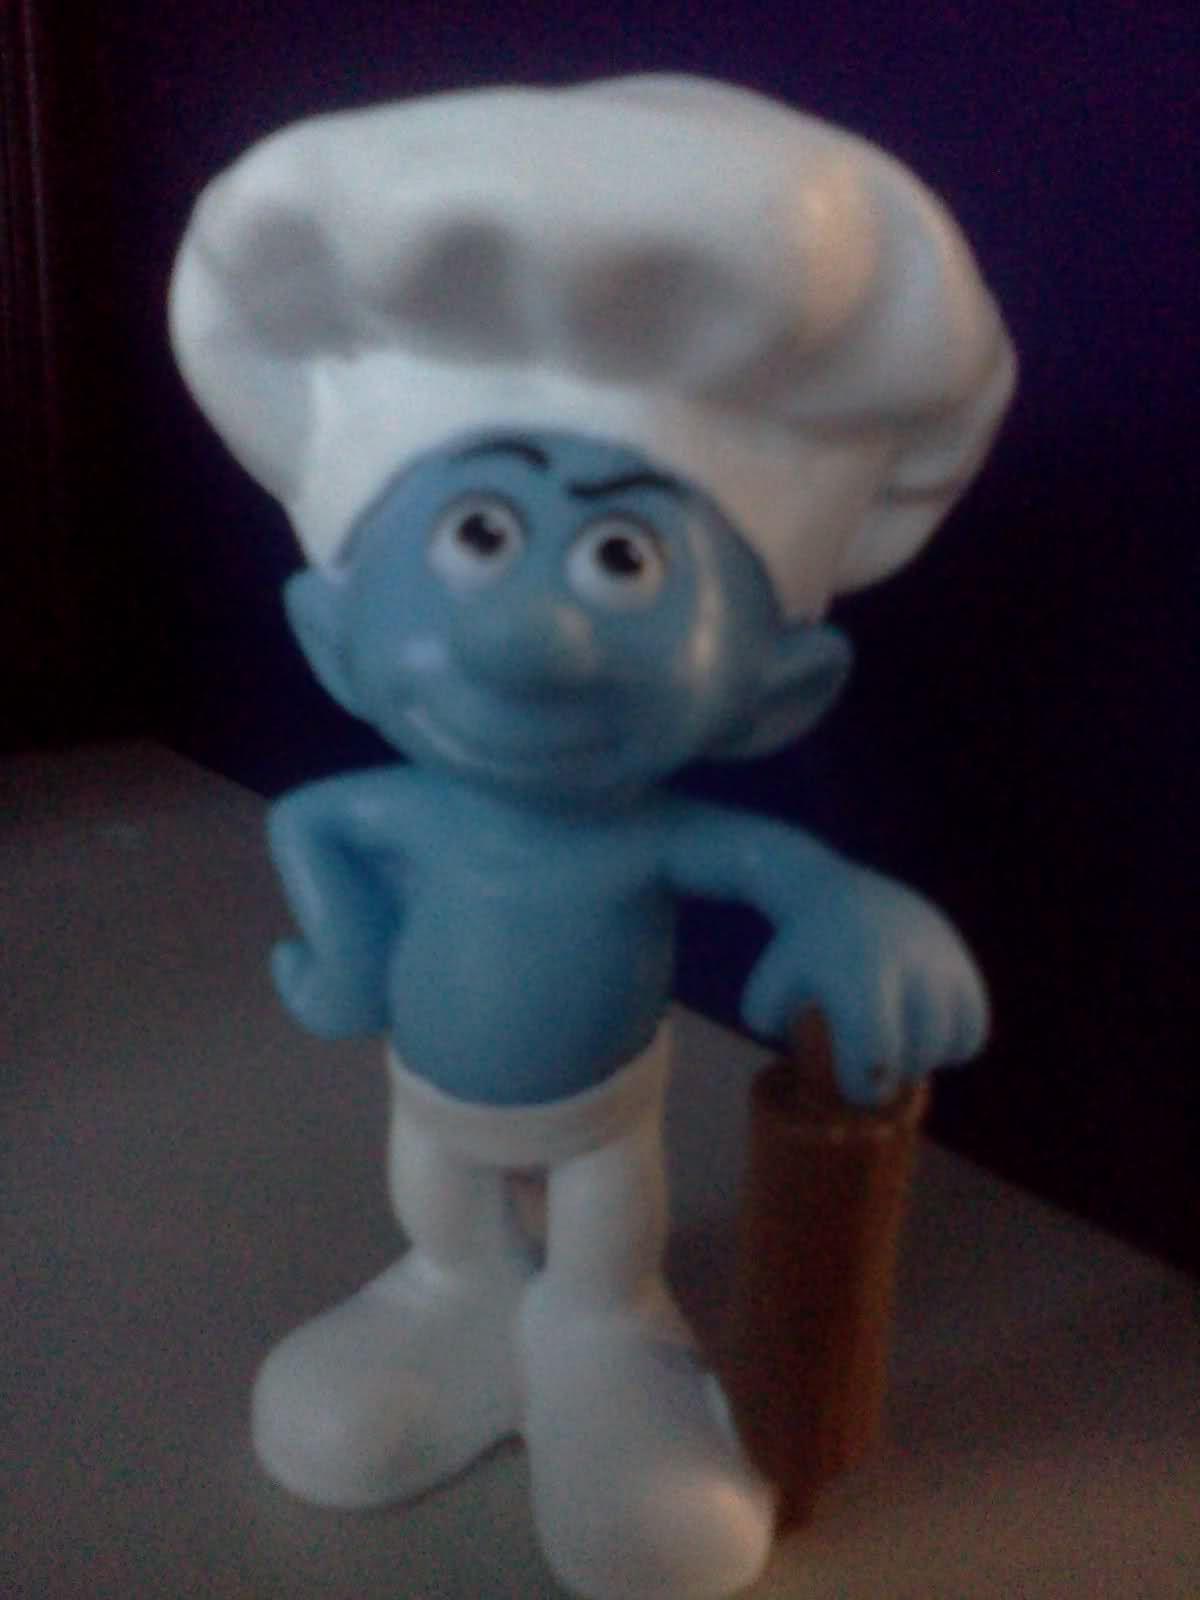 Baker Smurf Smurfs Smurfette Toy Collection